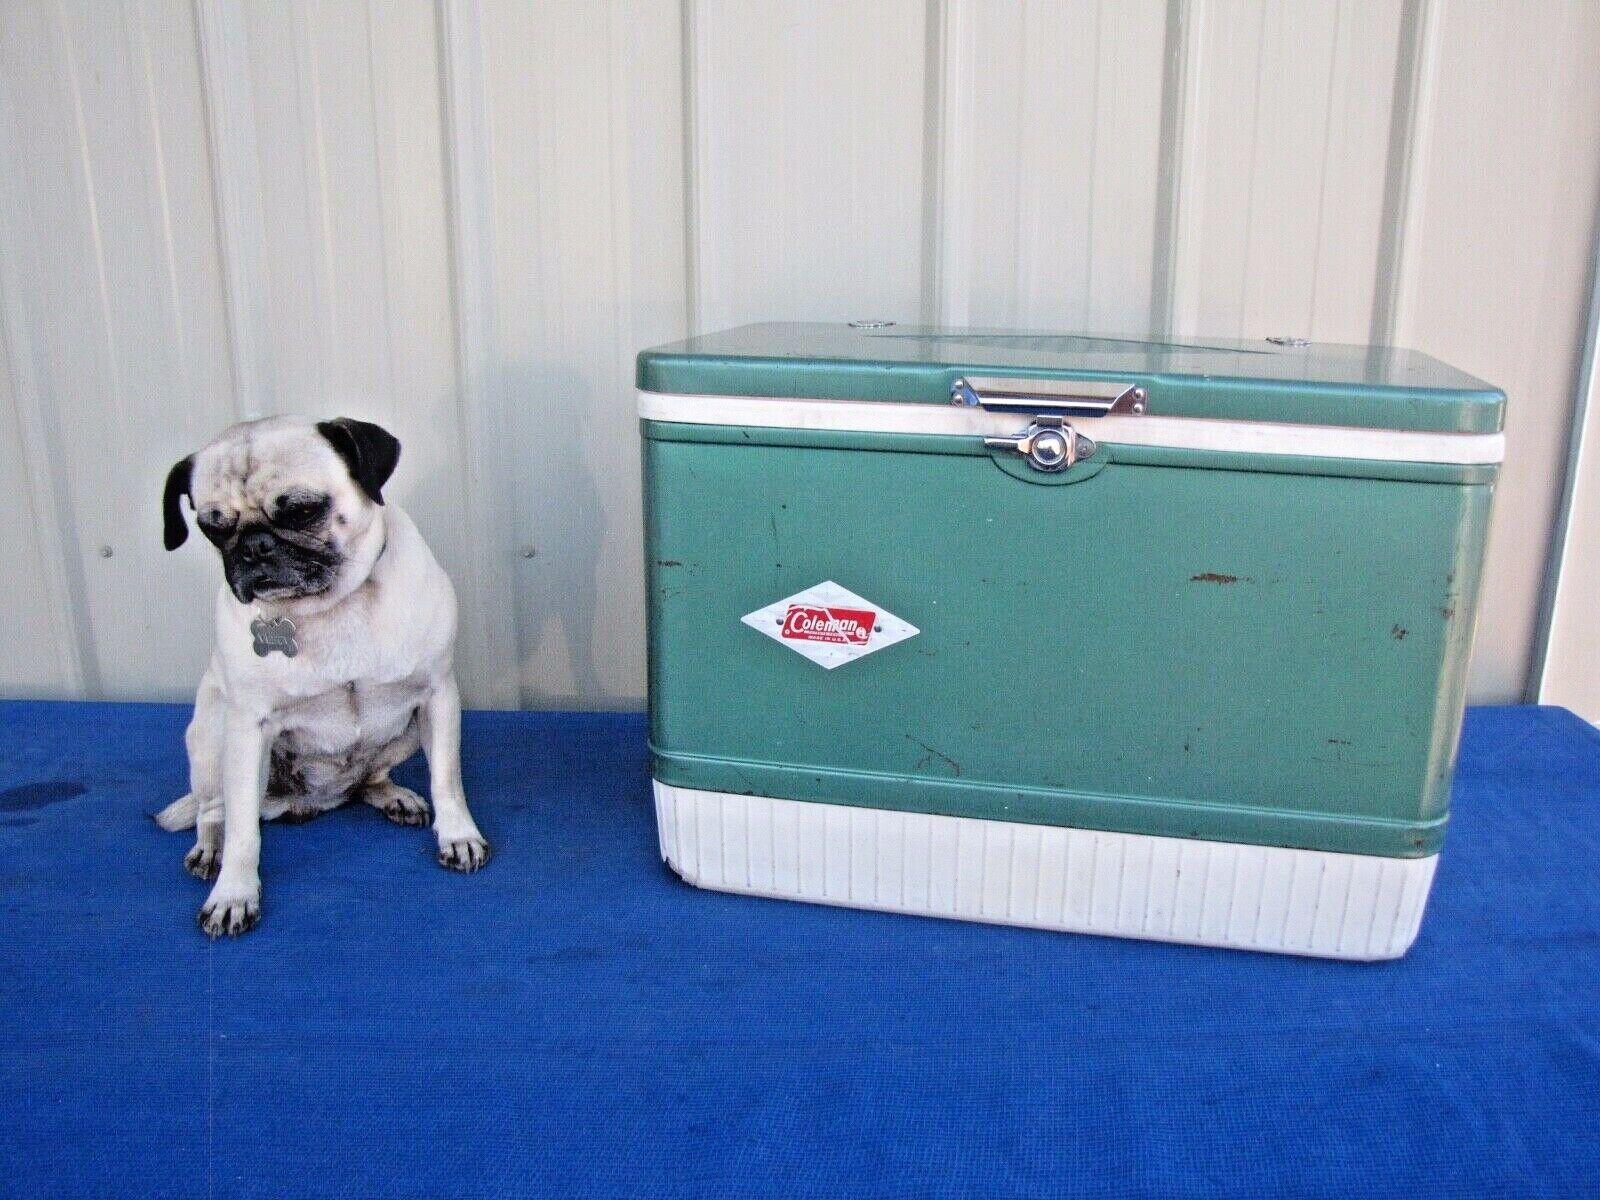 Vintage 1960's Colehomme Diamond vert Ice Cooler Chest Box 22  x 15  x 13